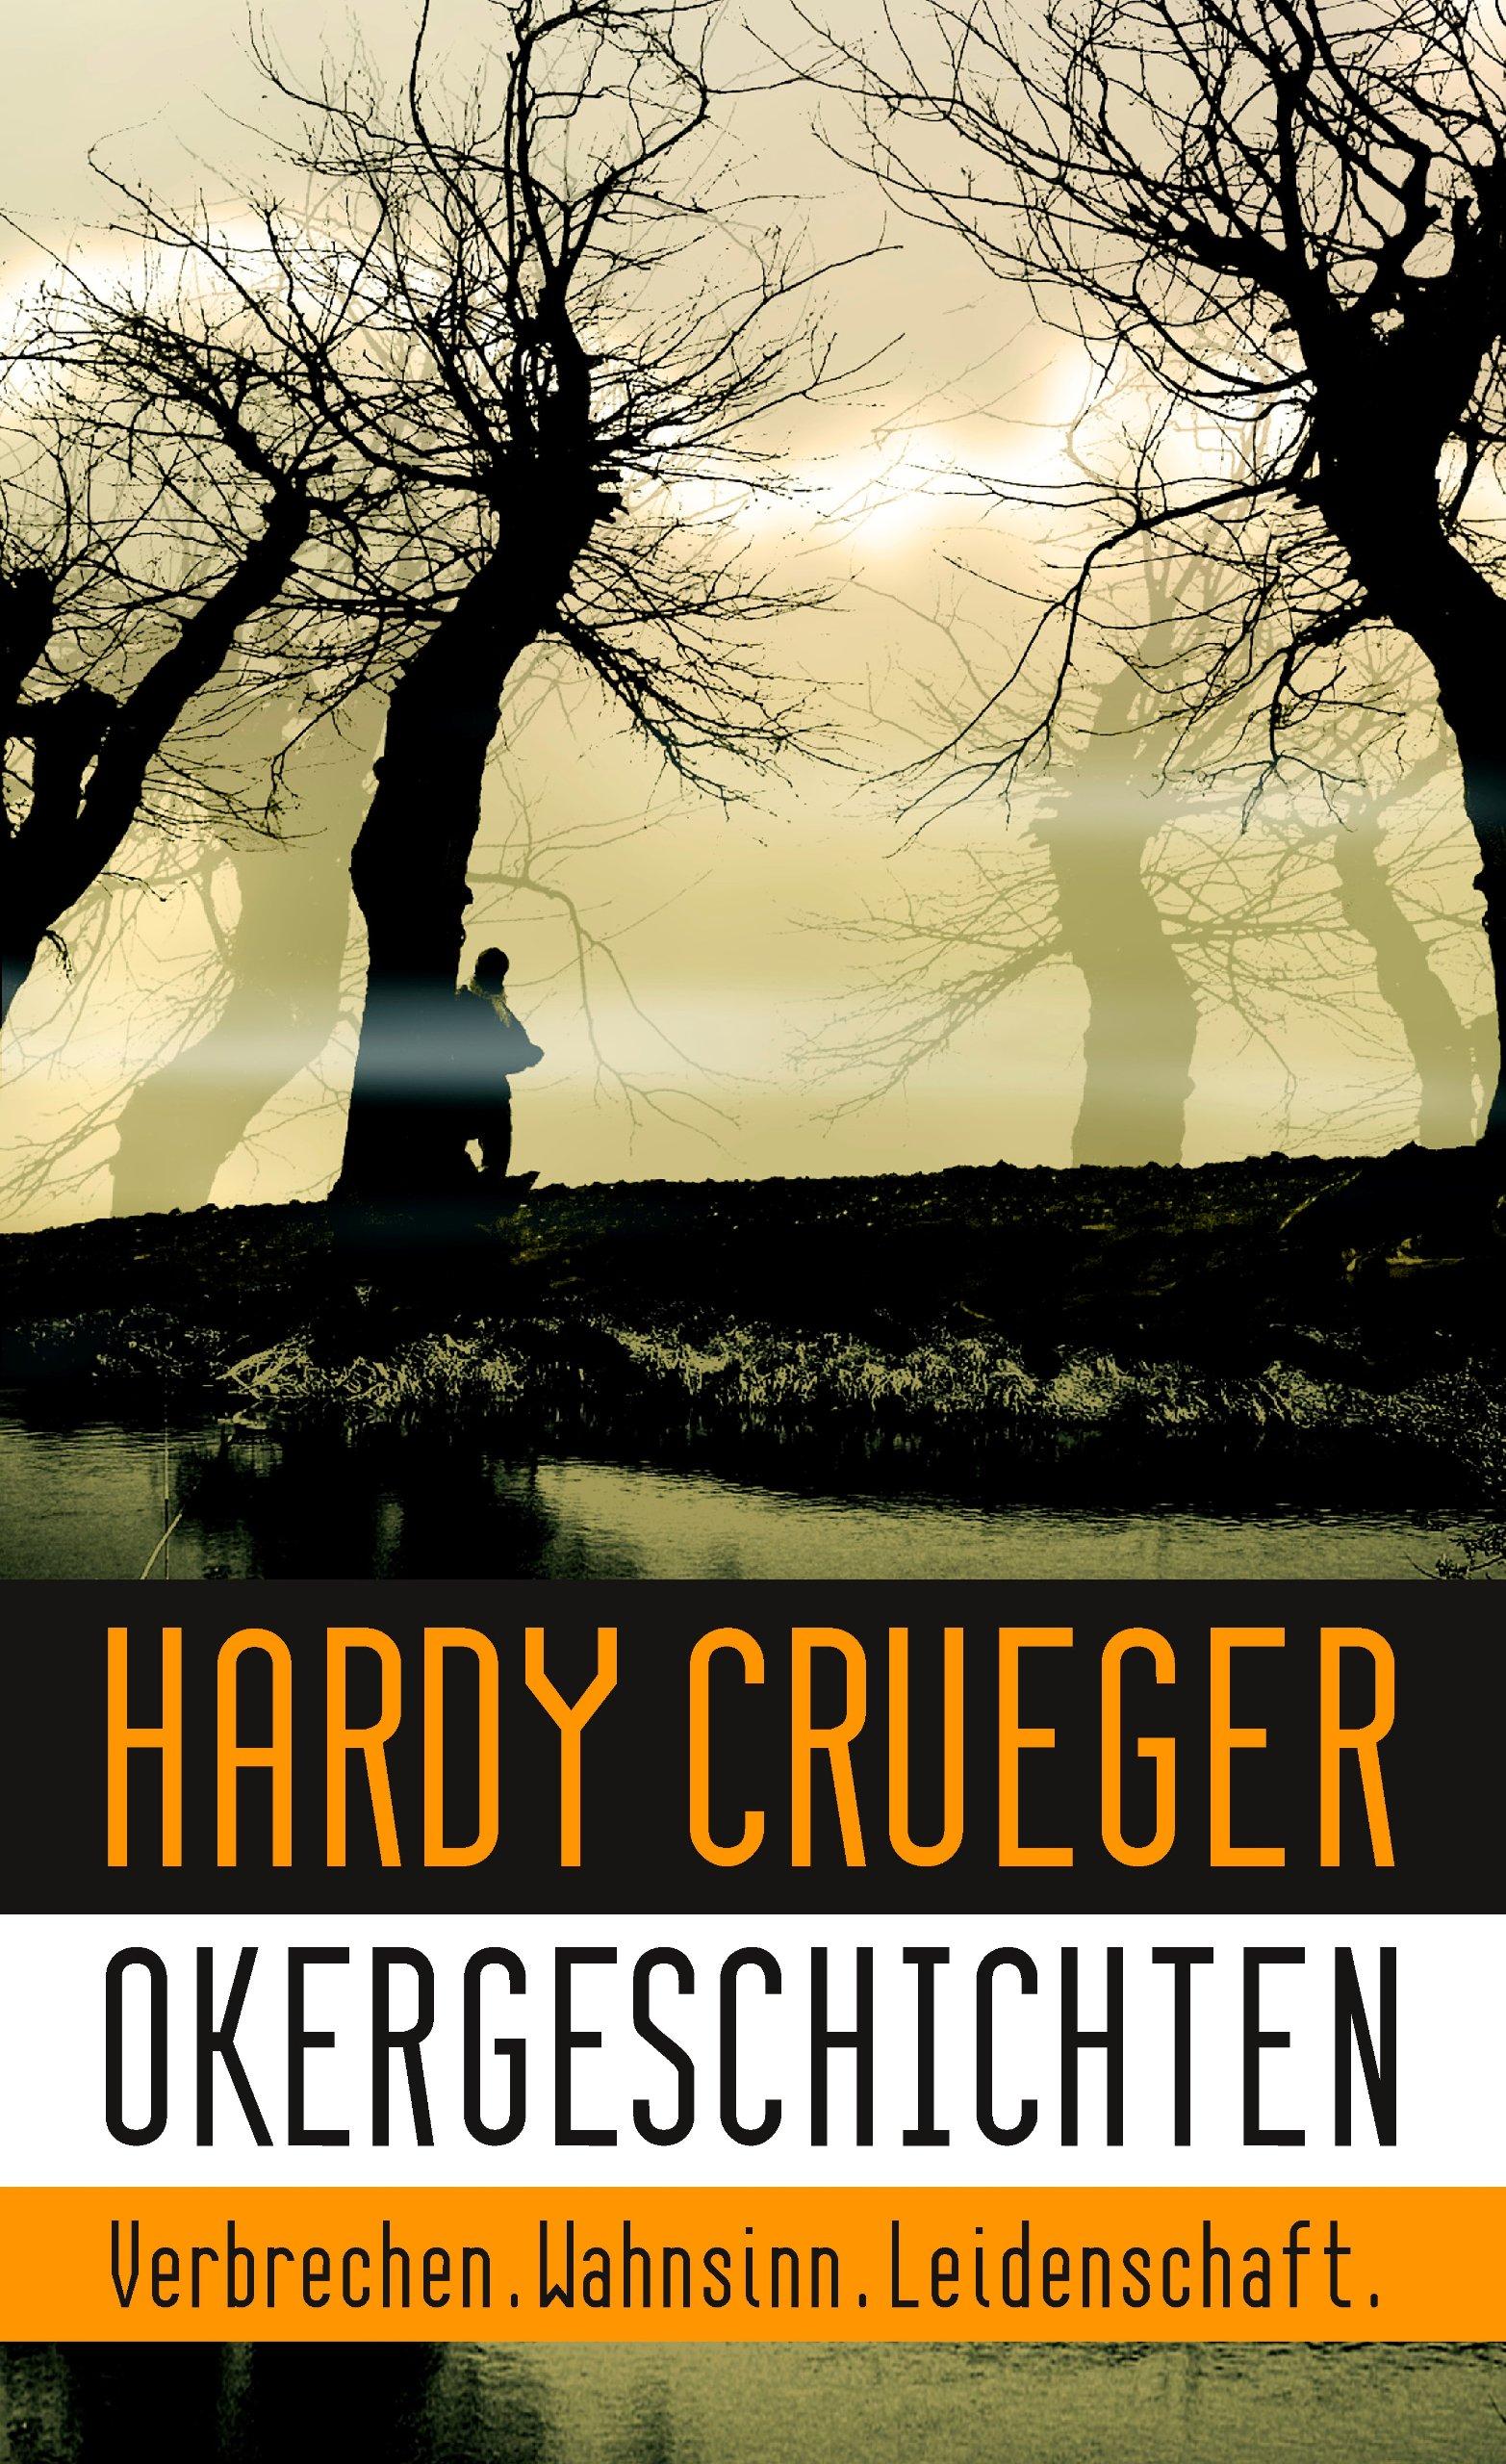 Okergeschichten - Verbrechen, Wahnsinn, Leidenschaft: 12 Crime Stories und Psychothriller